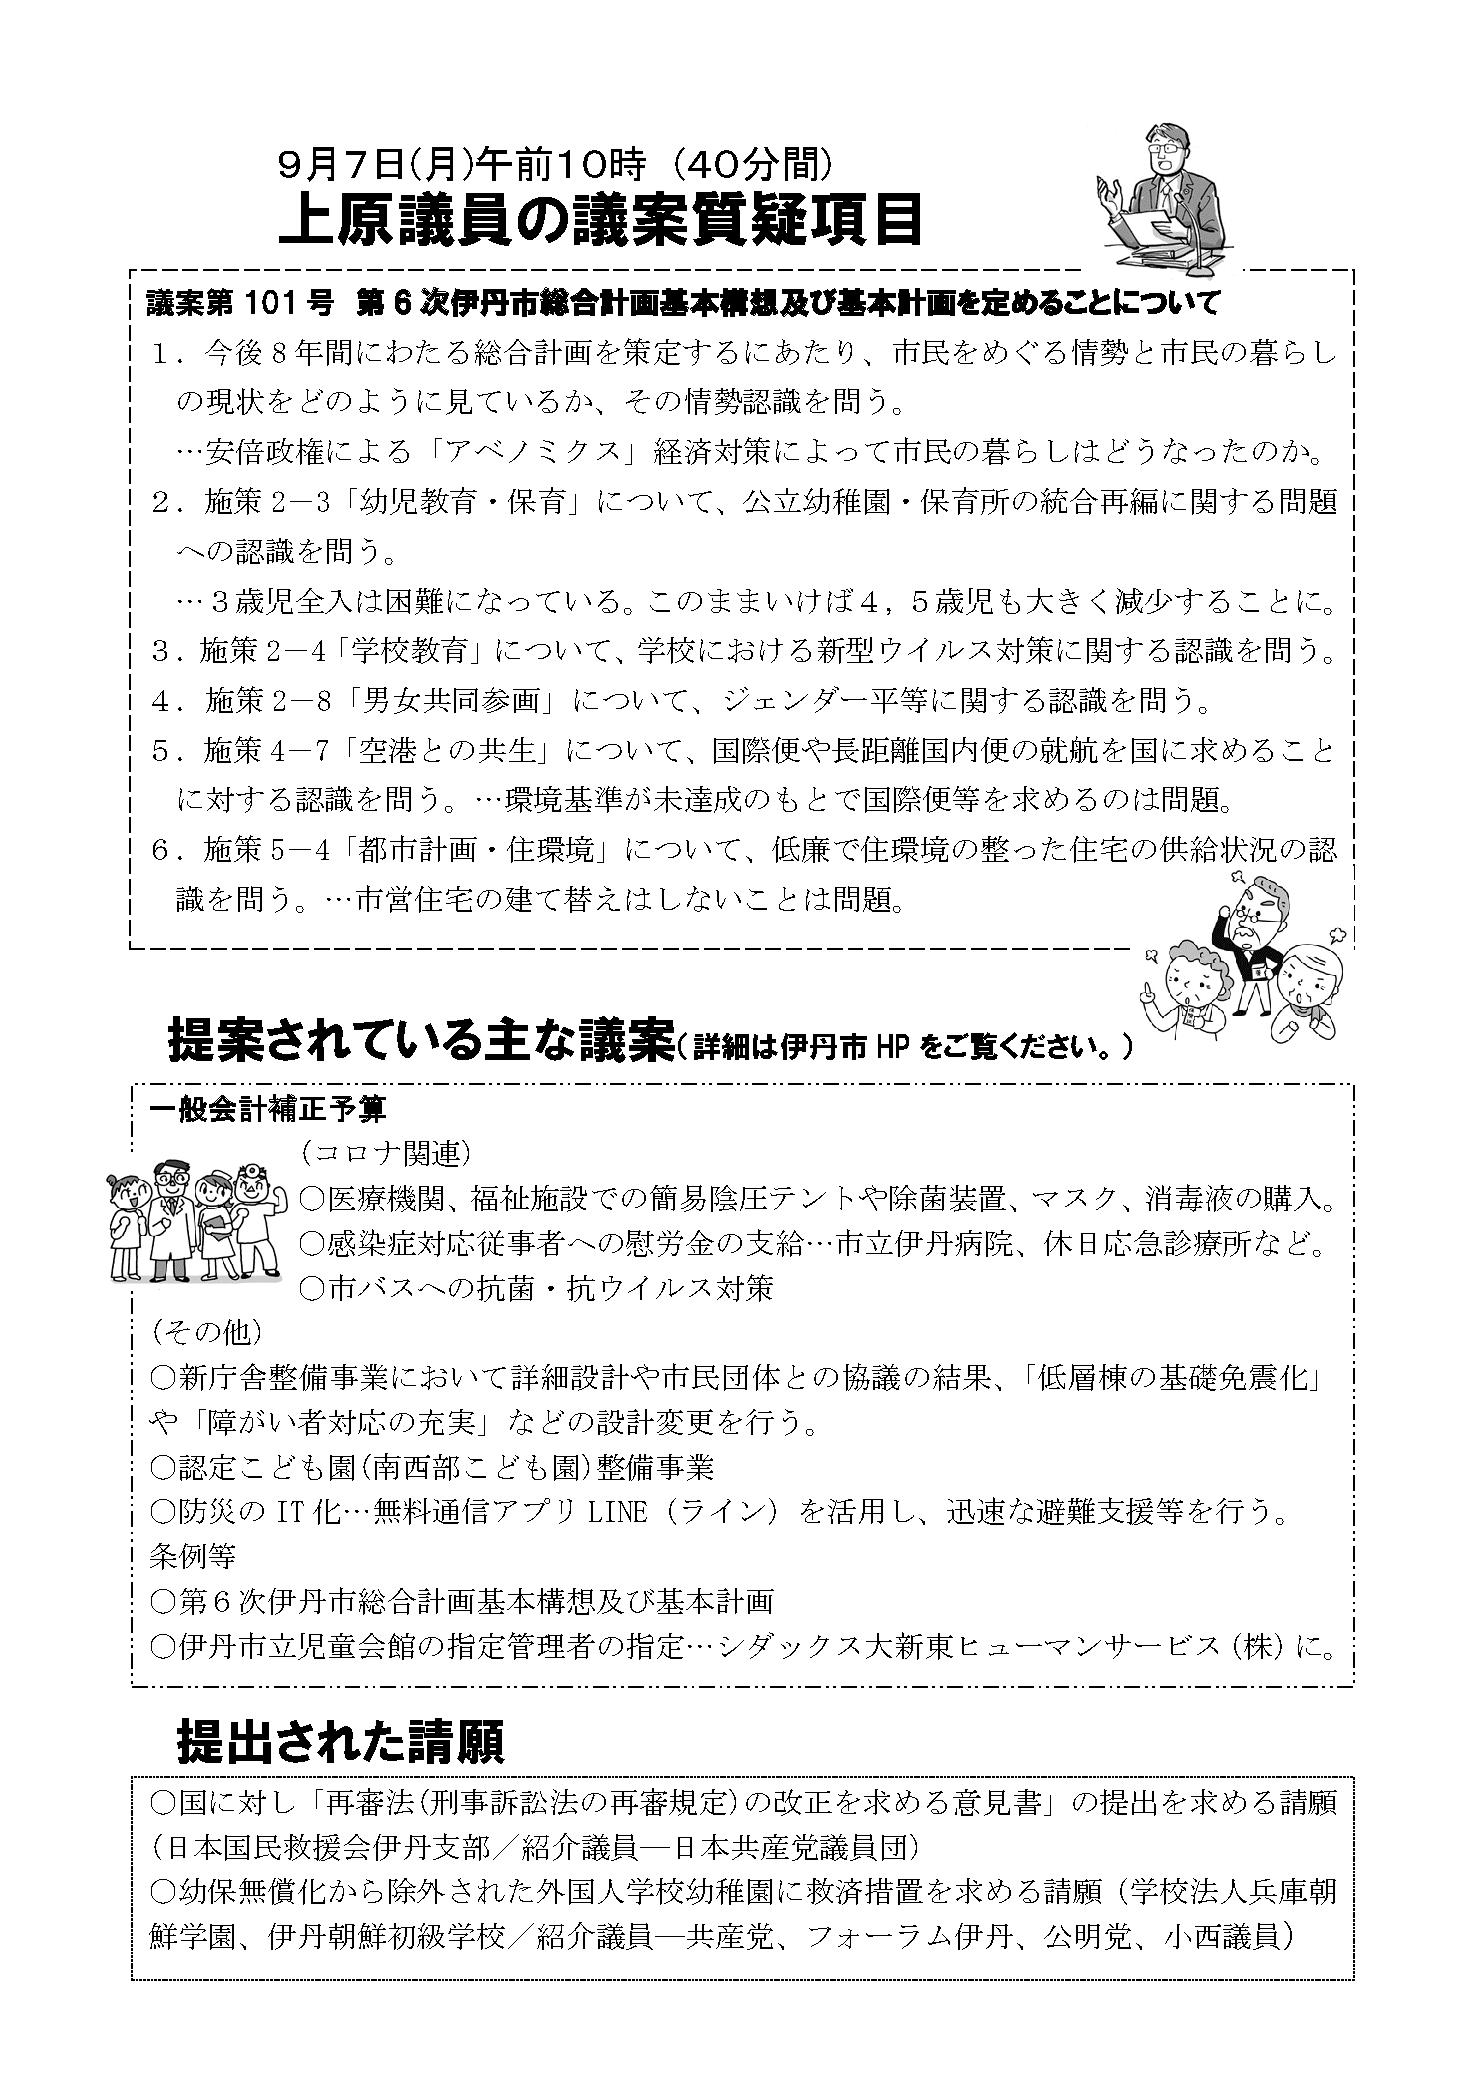 日本共産党伊丹市議団ニュース368号2面